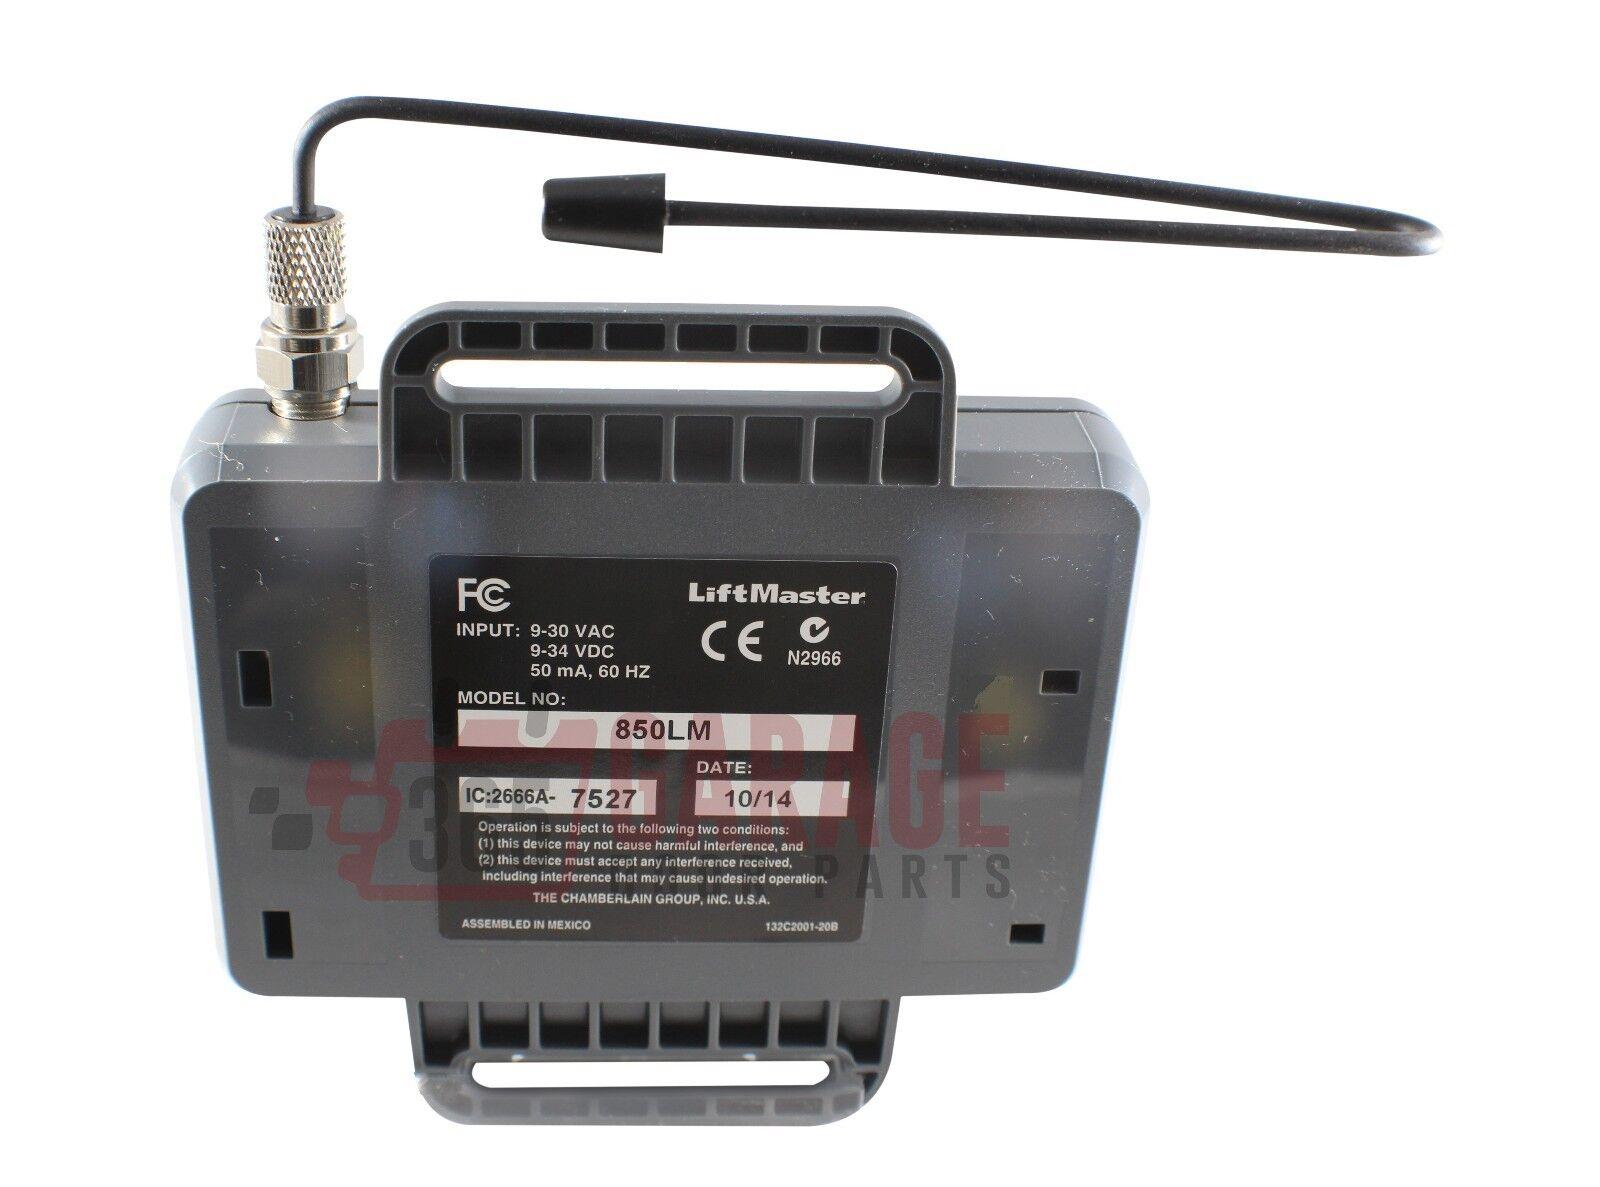 liftmaster 850lm universal gate and garage door opener receiver ebay rh ebay com Genie Garage Door Sensor Wiring Diagram Lift Master Sensor Wiring